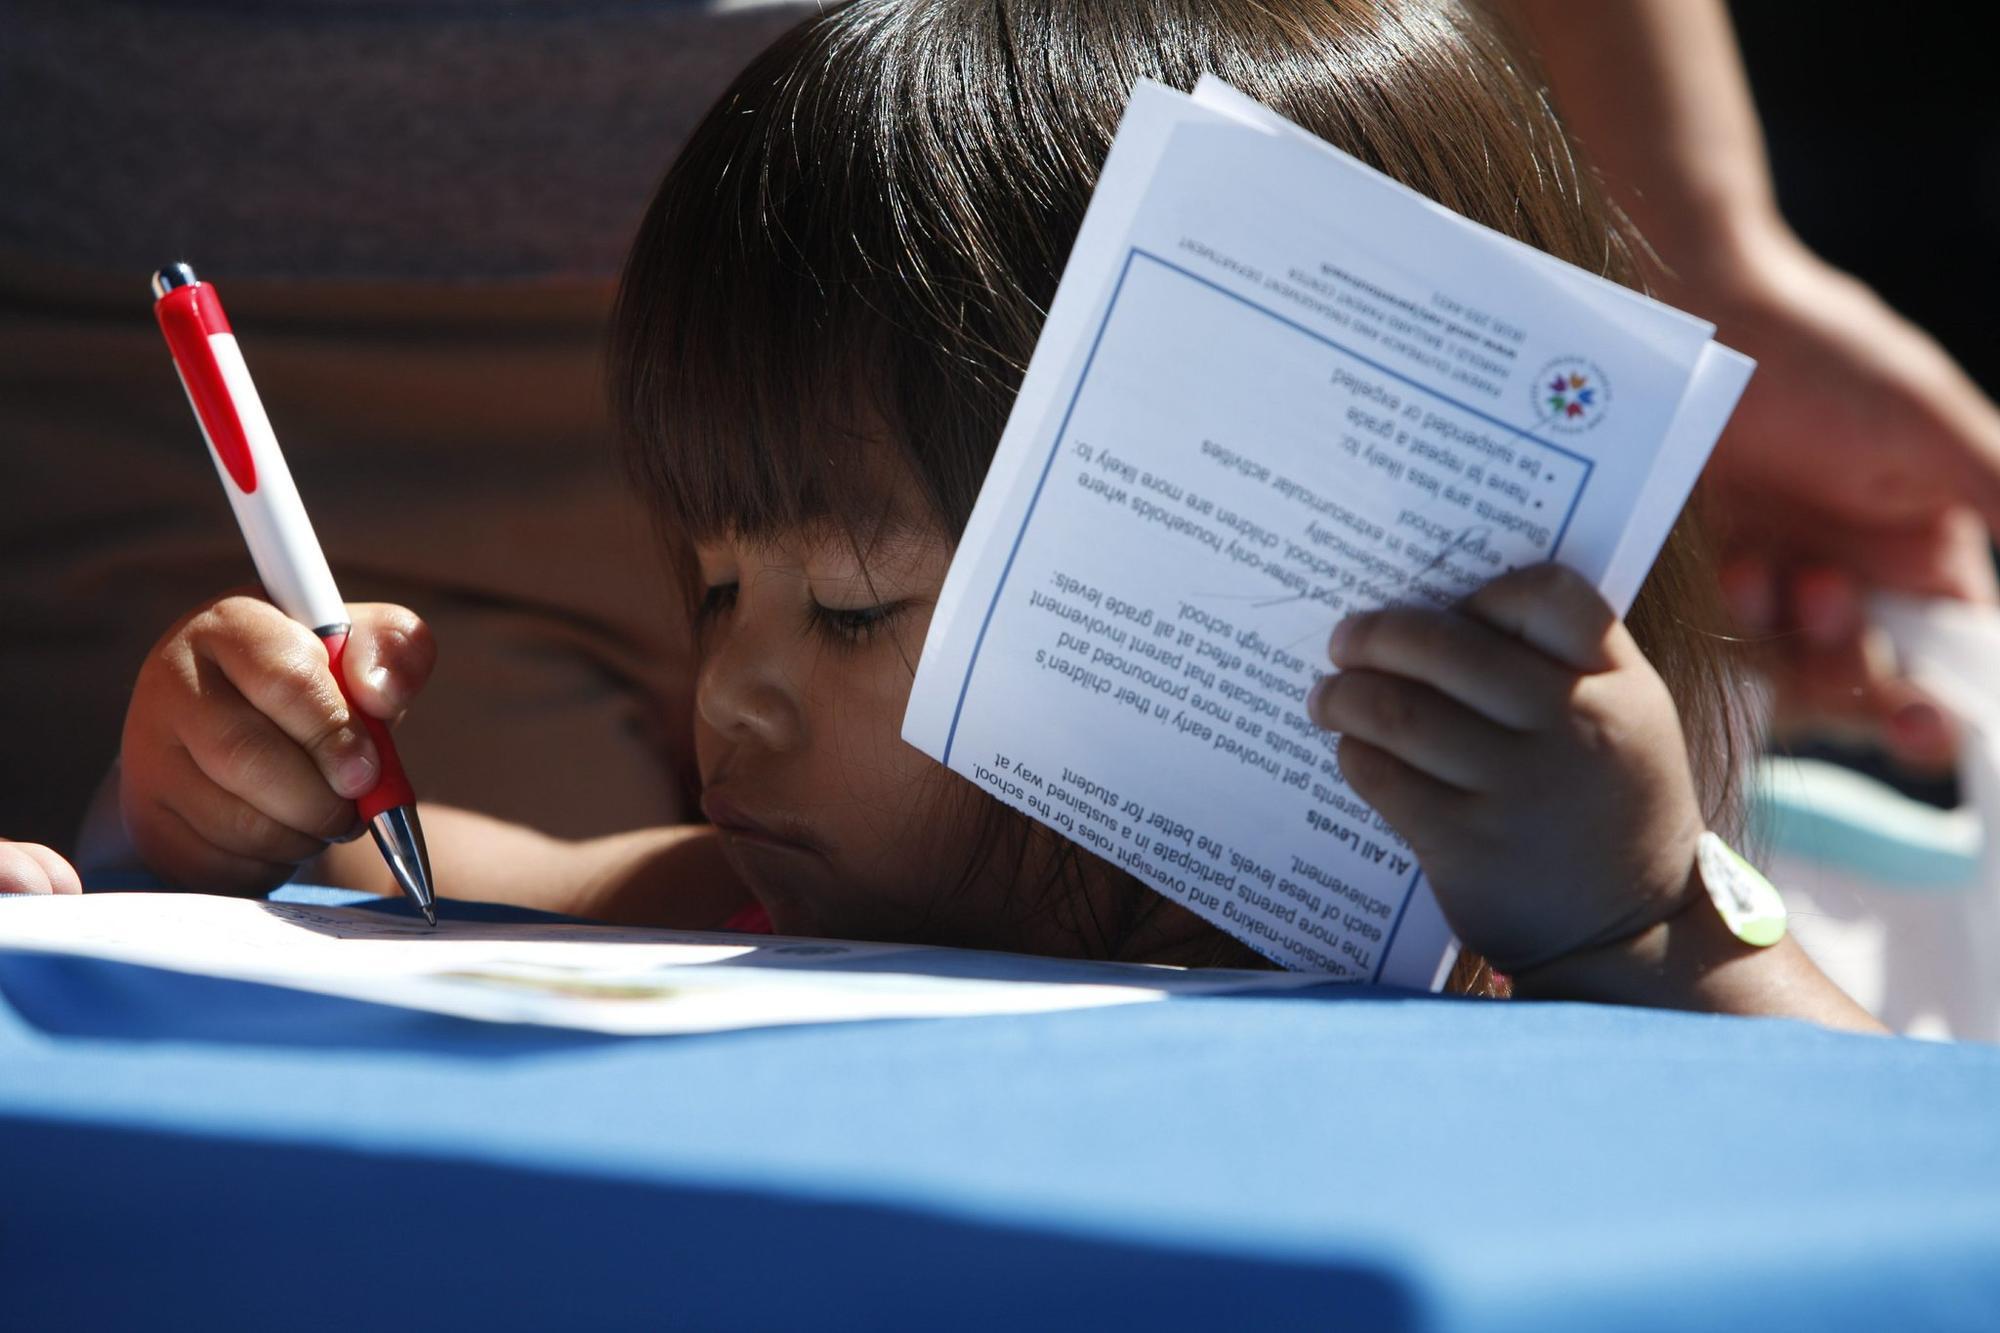 Skyler Smith of Serra Mesa prepares for preschool in the San Diego Unified School District. File photo.